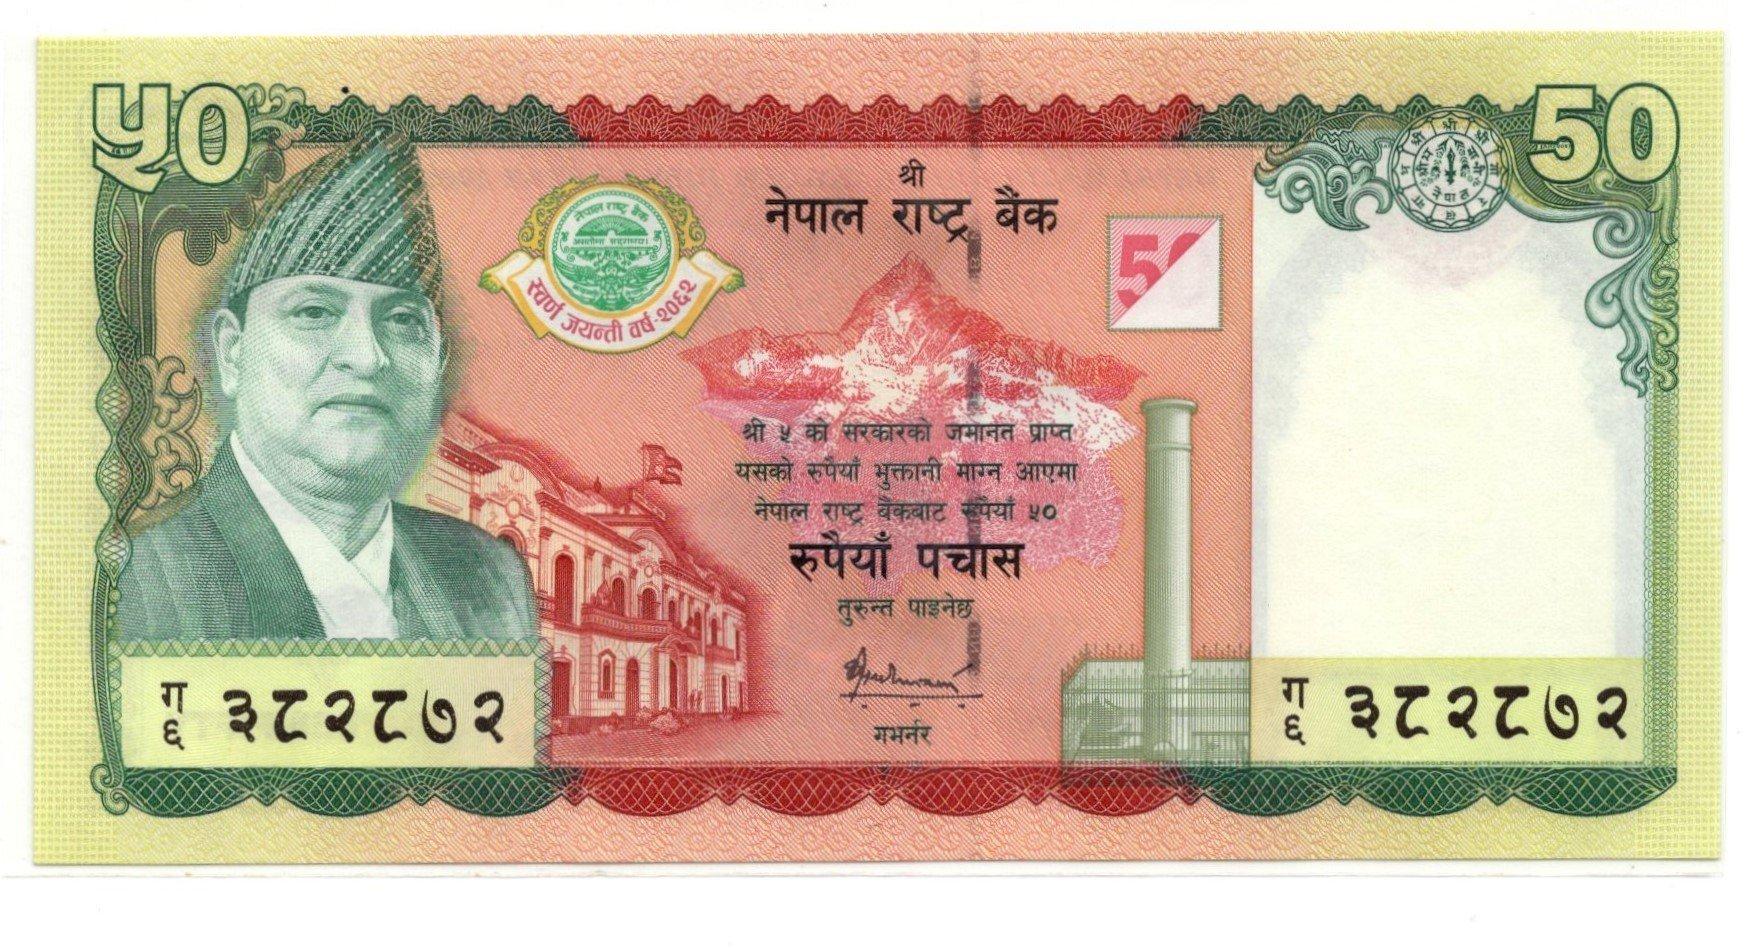 nela 50 rupees golden jubilee